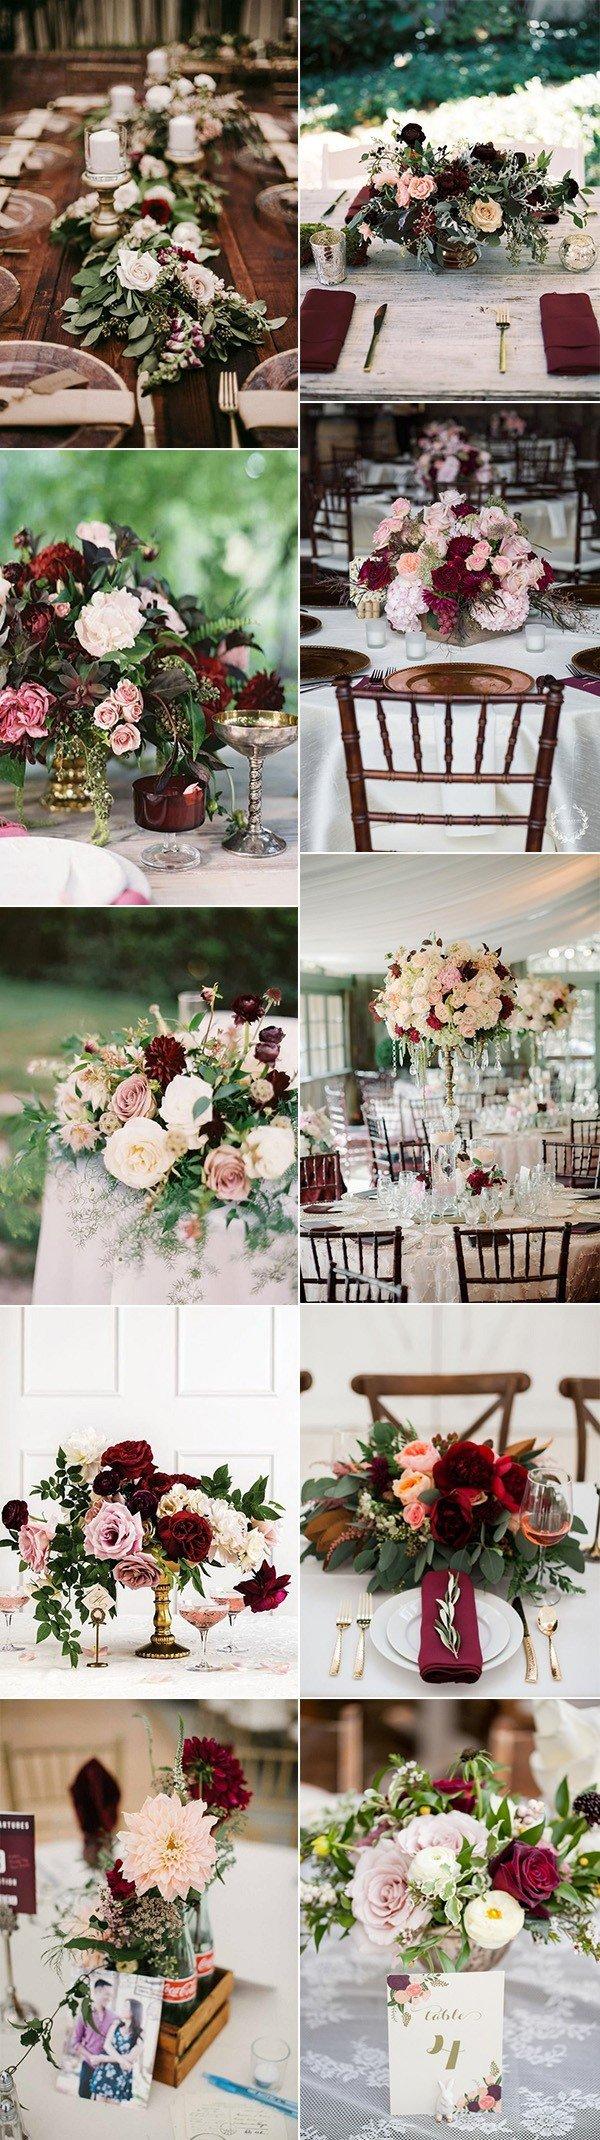 trending burgundy and blush wedding centerpiece ideas